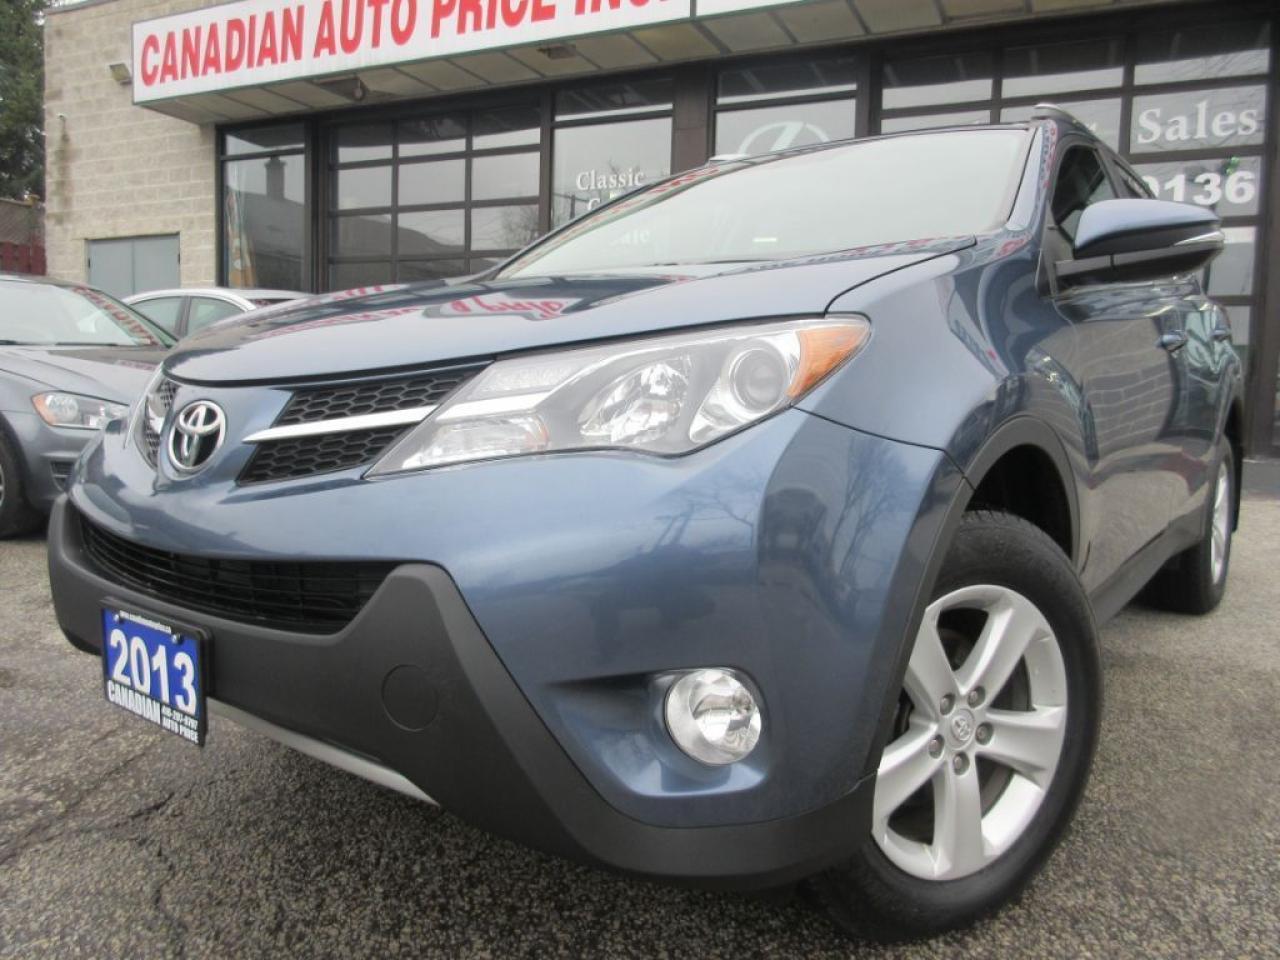 2013 Toyota RAV4 XLE - AWD- CAMERA-BLUETOOTH-SUNROOF-HEATED SEATS